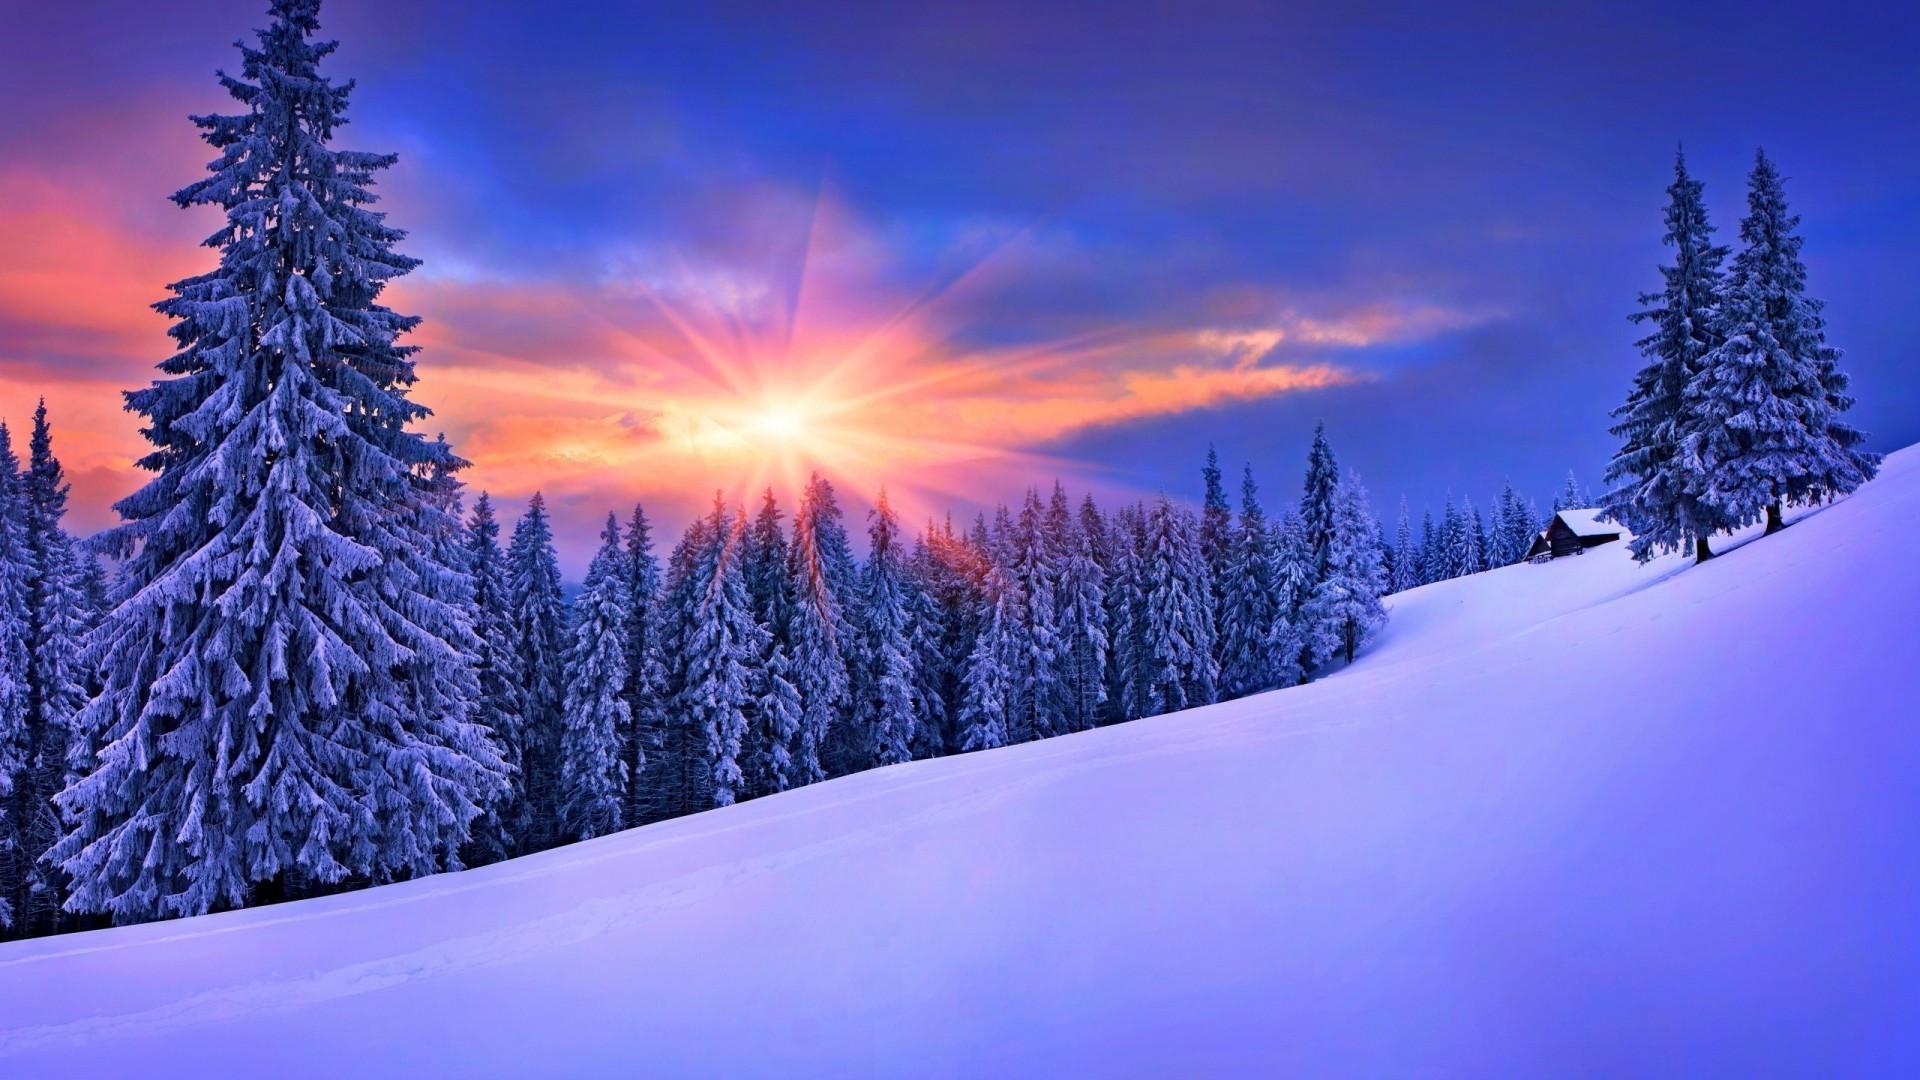 Winter Landscapes Desktop Wallpaper 1920x1080